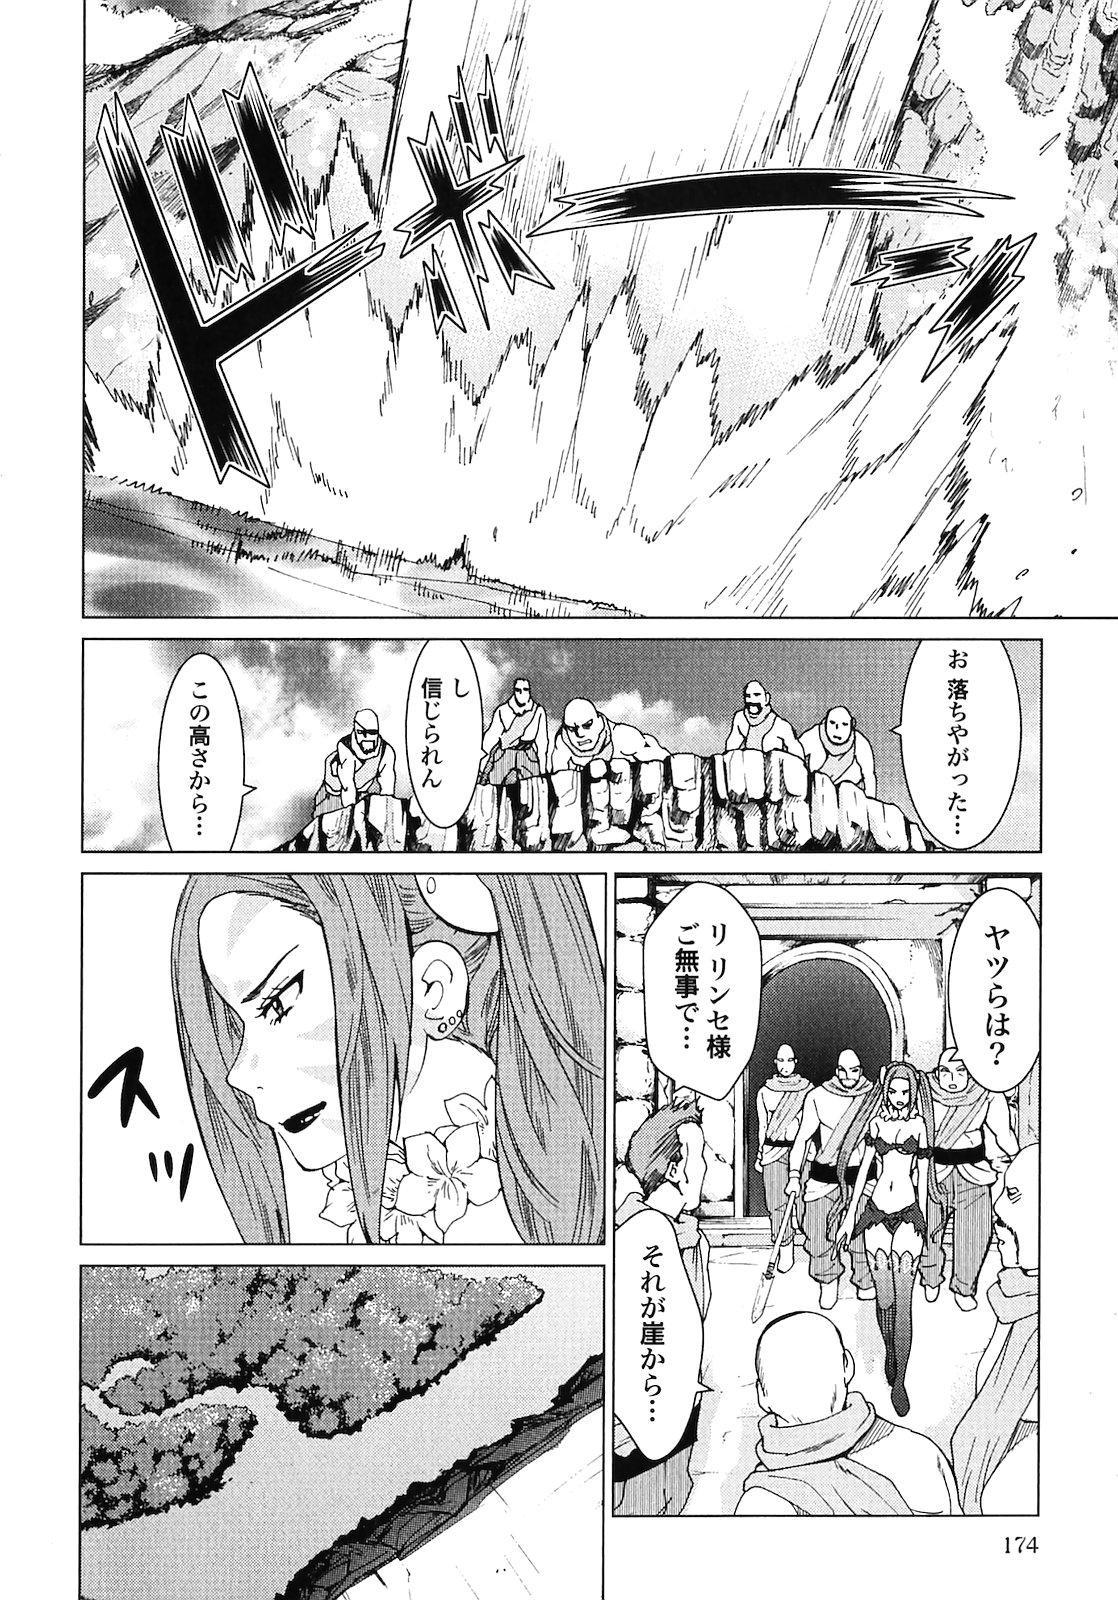 Makyo no Shanana Vol.02 175